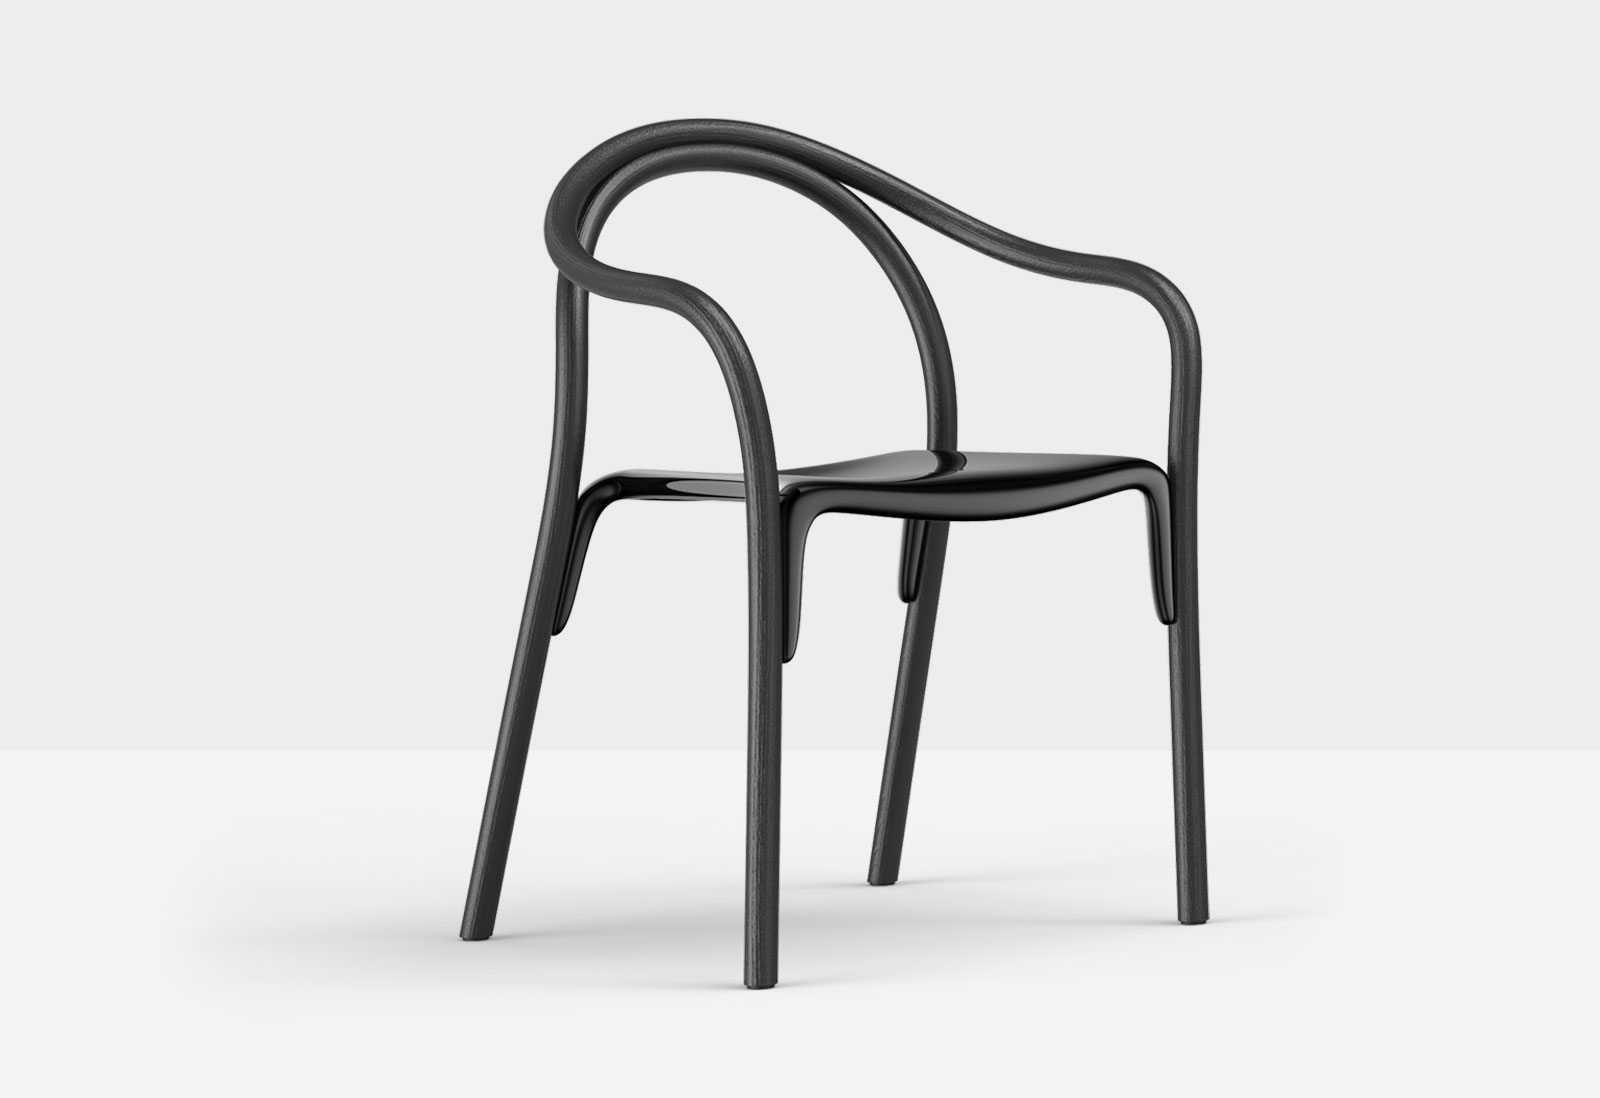 Soul la cadira tienda sillas barcelona sillas de estilo barcelona sillas de oficina barcelona - Cadira barcelona ...